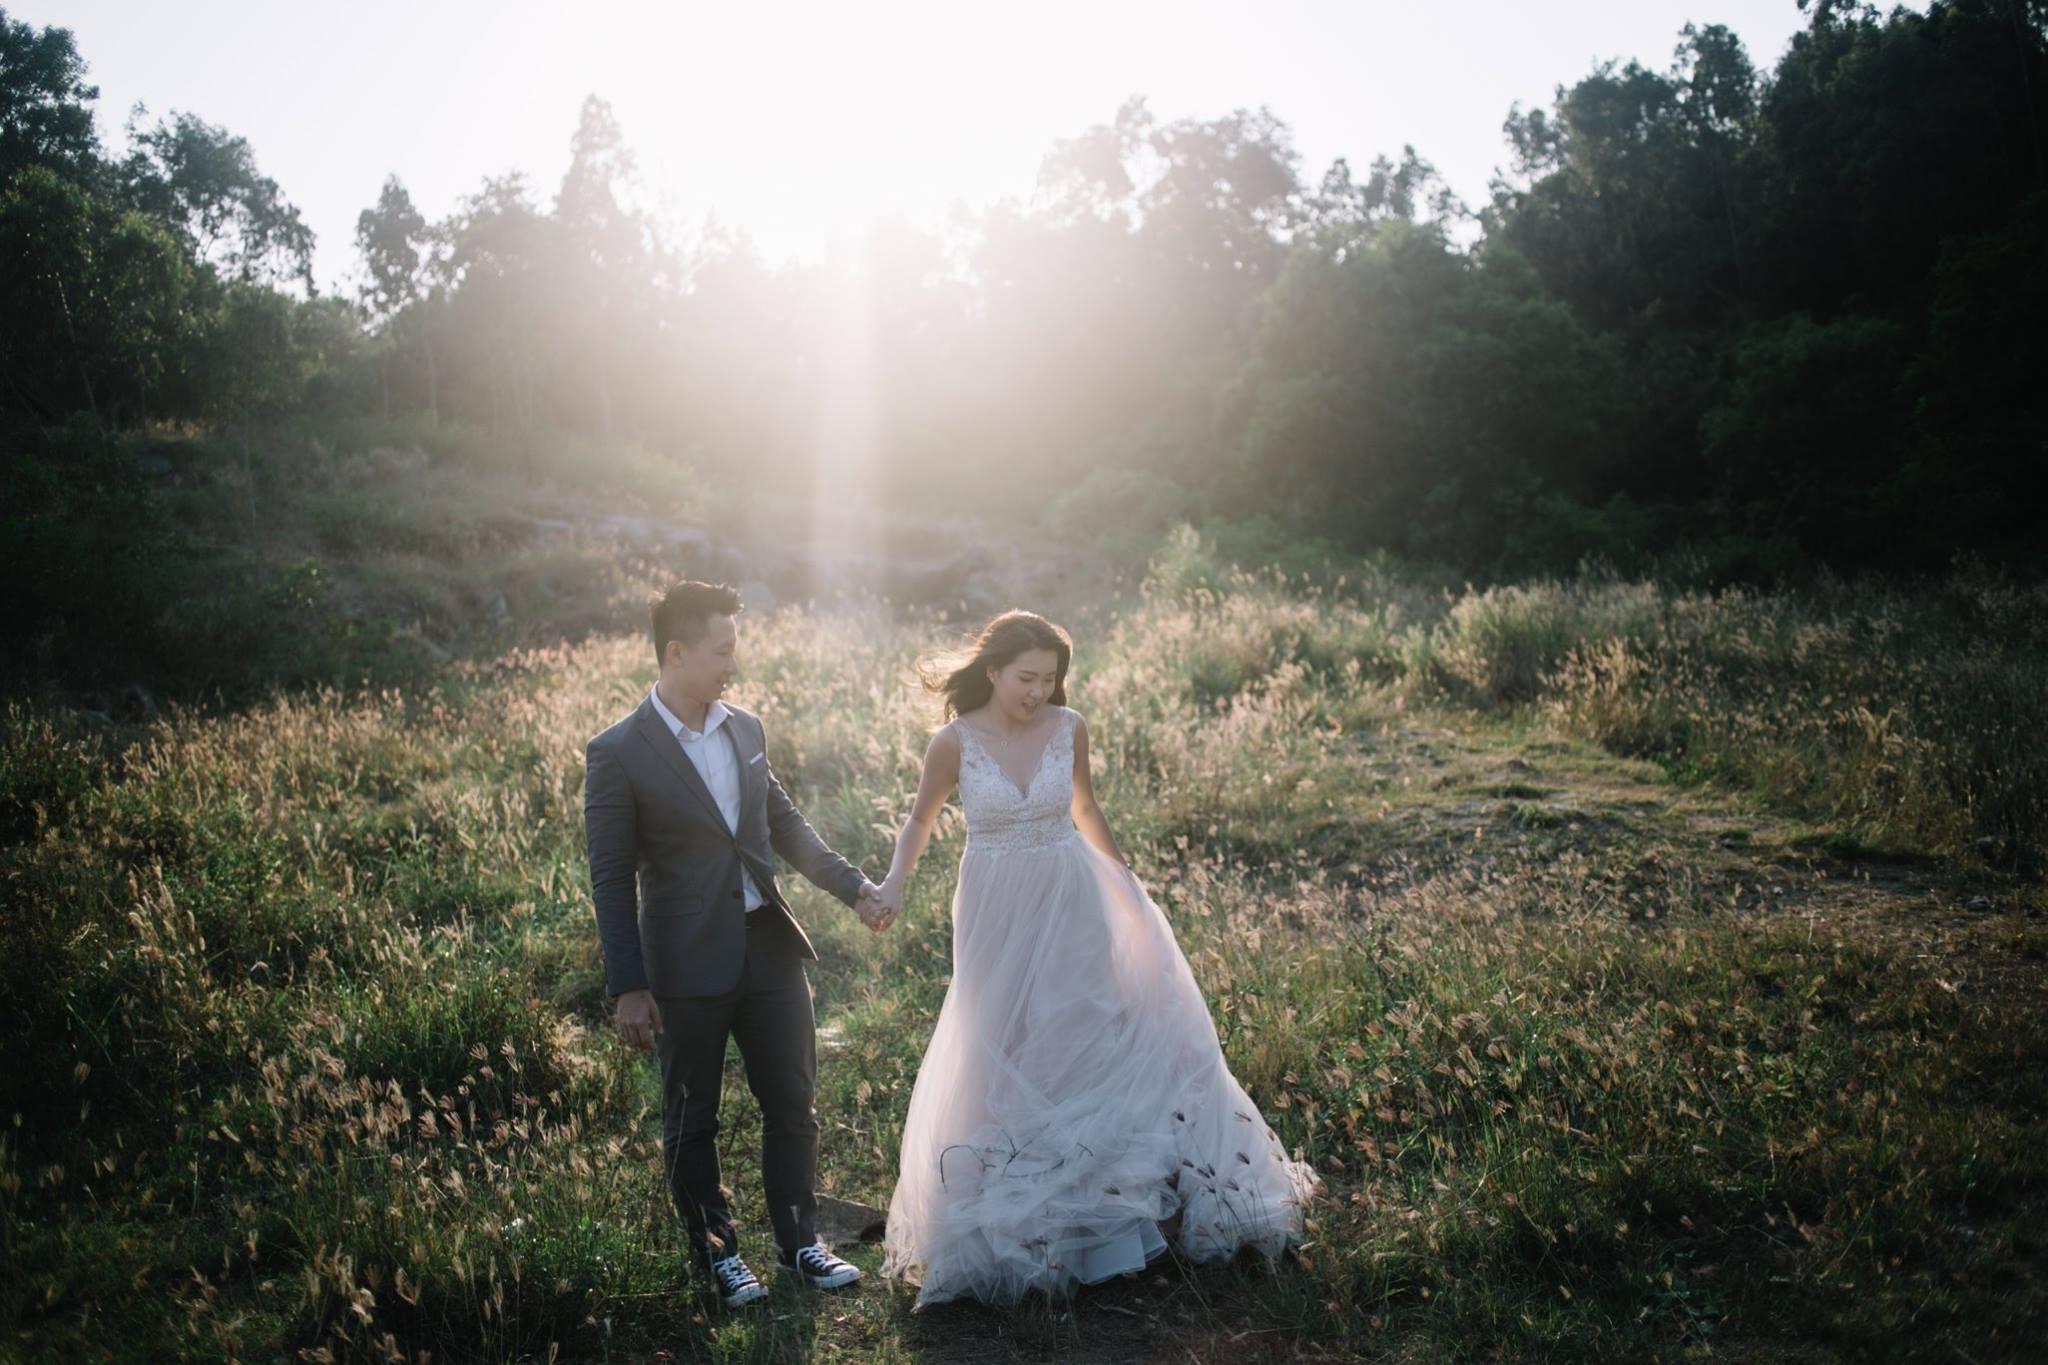 Danang-Hoi An-Wedding-Photography-161.jpg